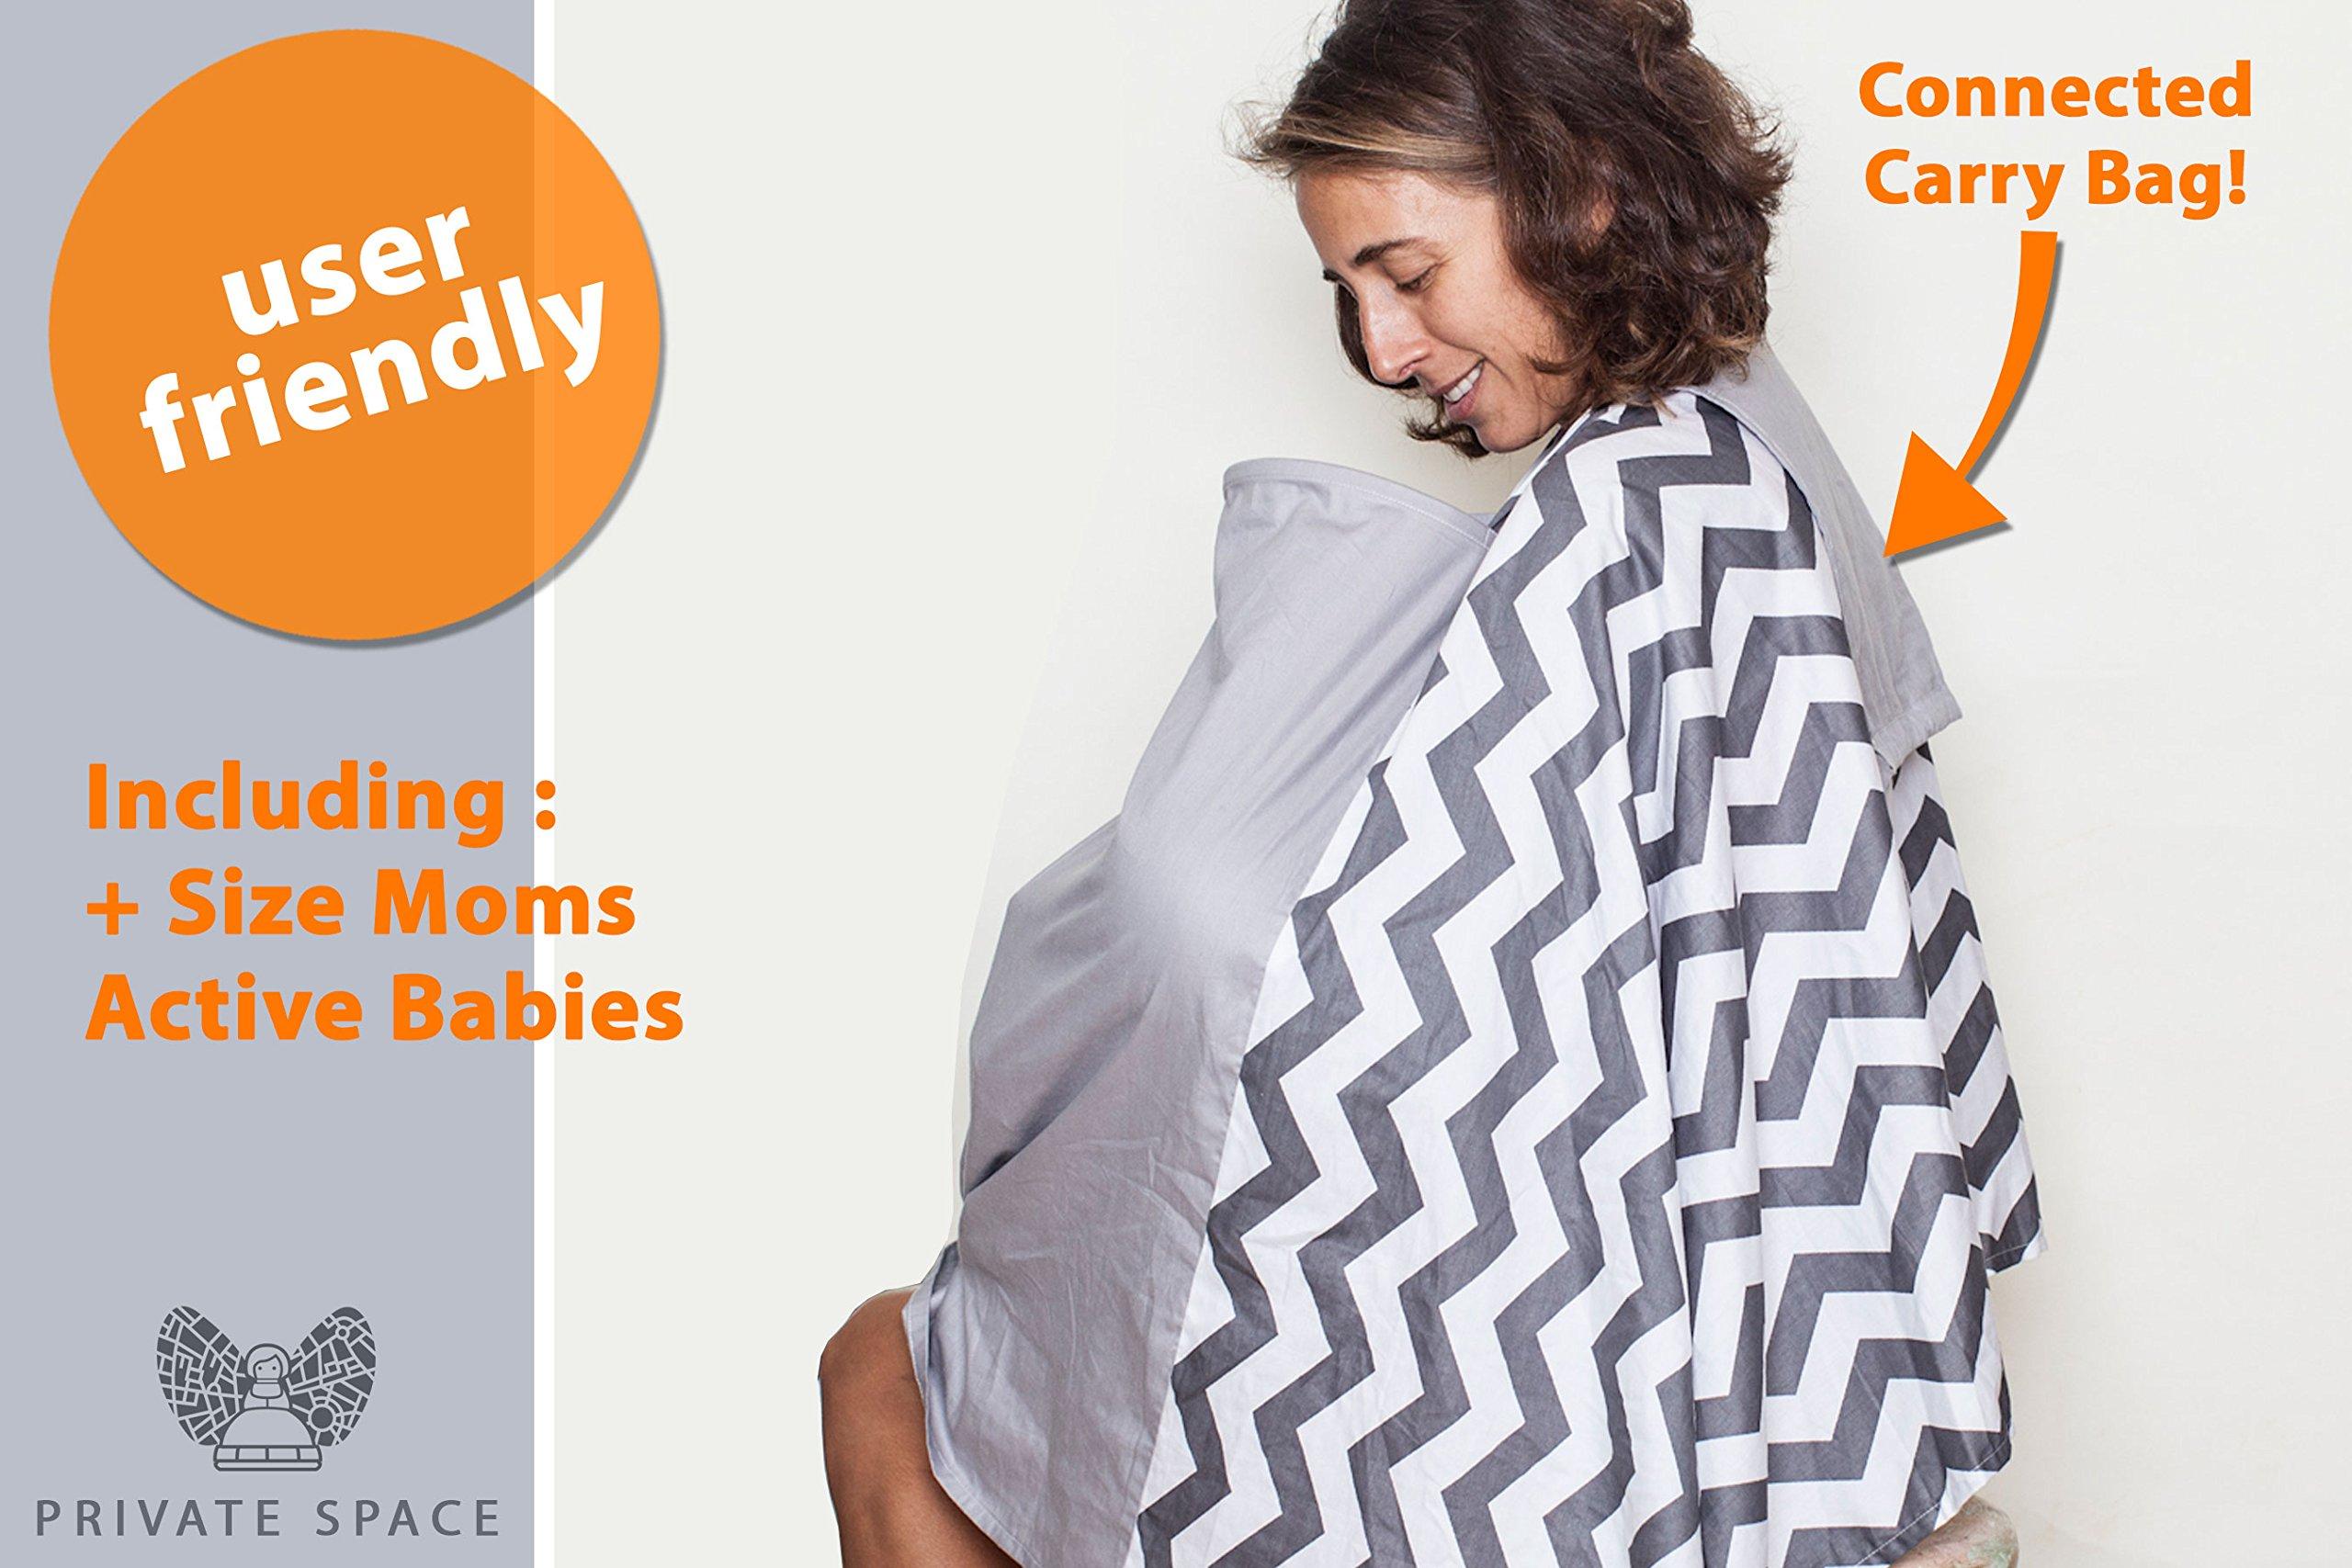 Fair-e-Trade Poncho Rigid Neckline Nursing Cover, 100% Premium Breathable Cotton by Fair-e-Trade (Image #4)